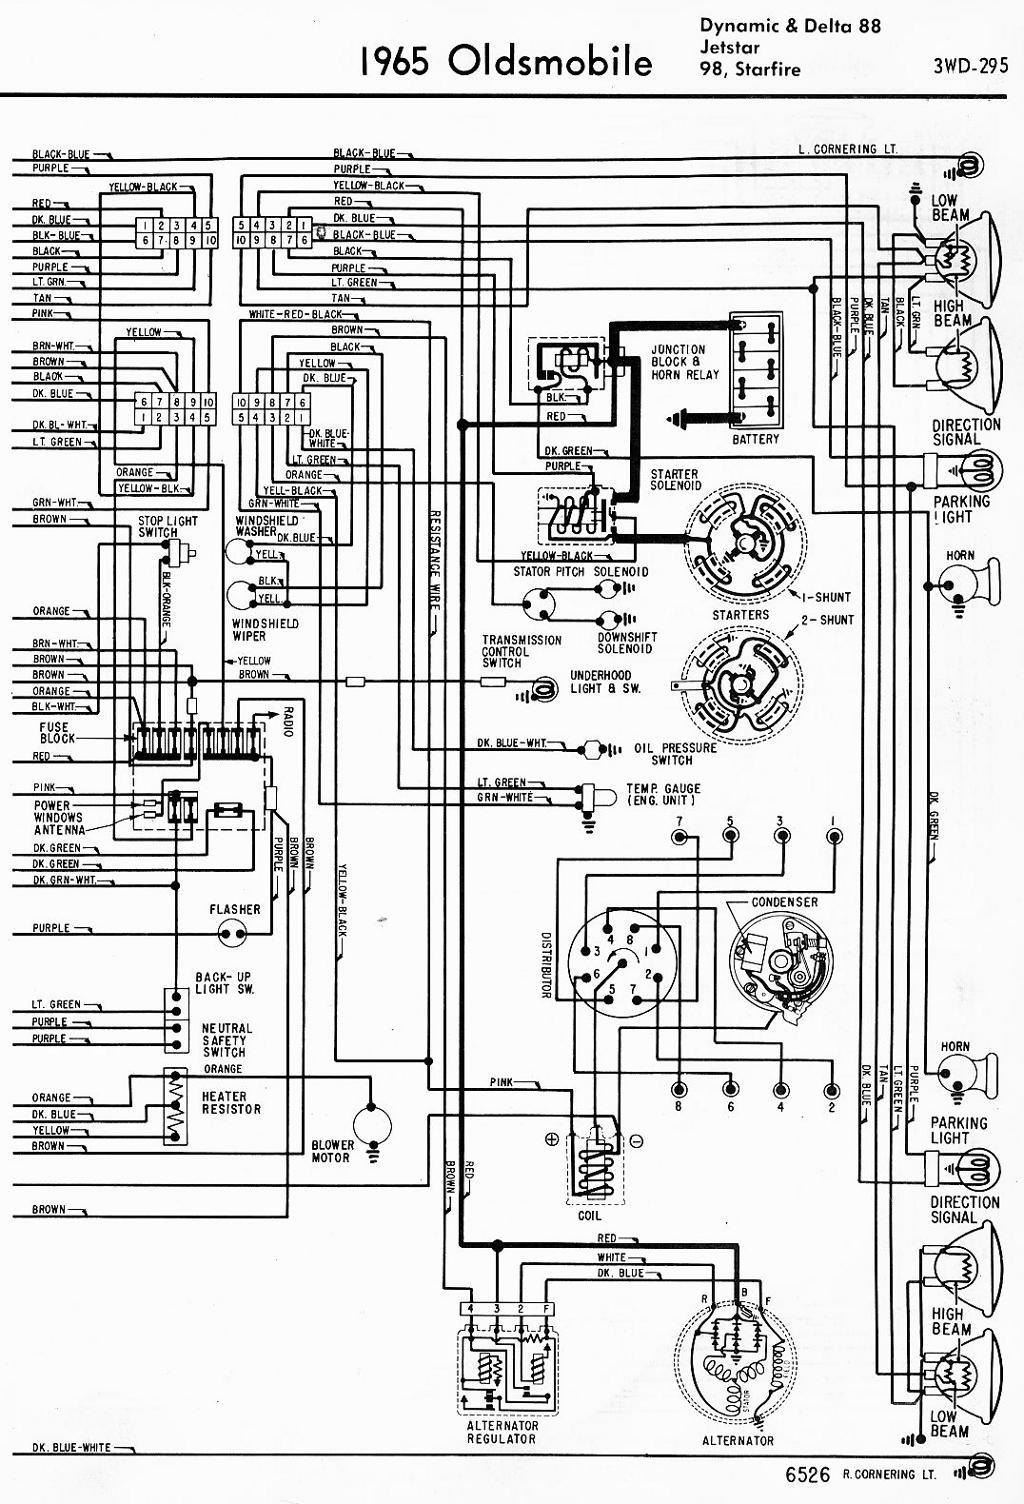 toyota t100 headlight wiring diagram ford ranger headlight 1995 toyota t100 taillight wiring diagrams 1995 toyota [ 1024 x 1504 Pixel ]